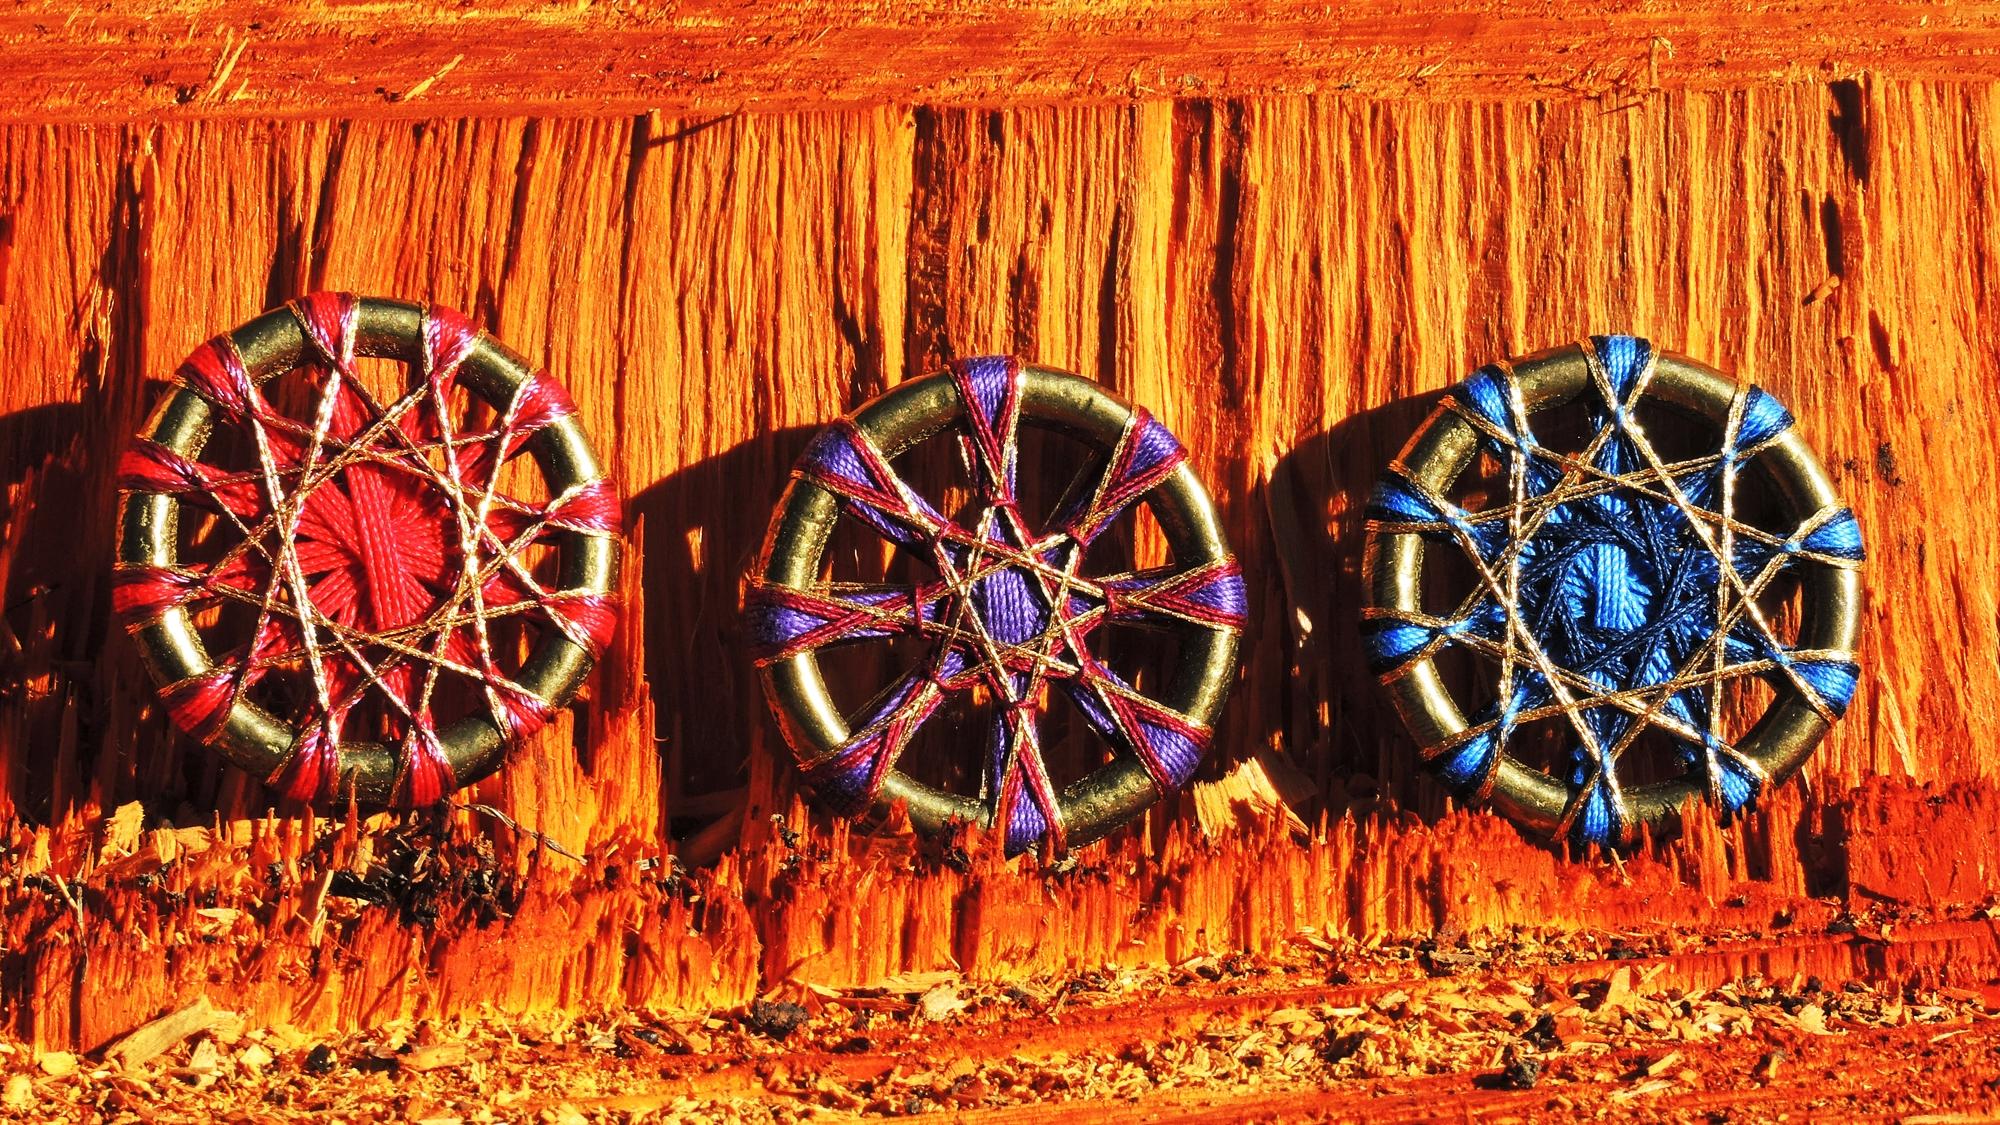 Nr. 20  3 Zwirnknopf-Anhänger | Ø  45 mm, Dicke 5 mm | Material: Baumwolle, Messing, Goldgarn